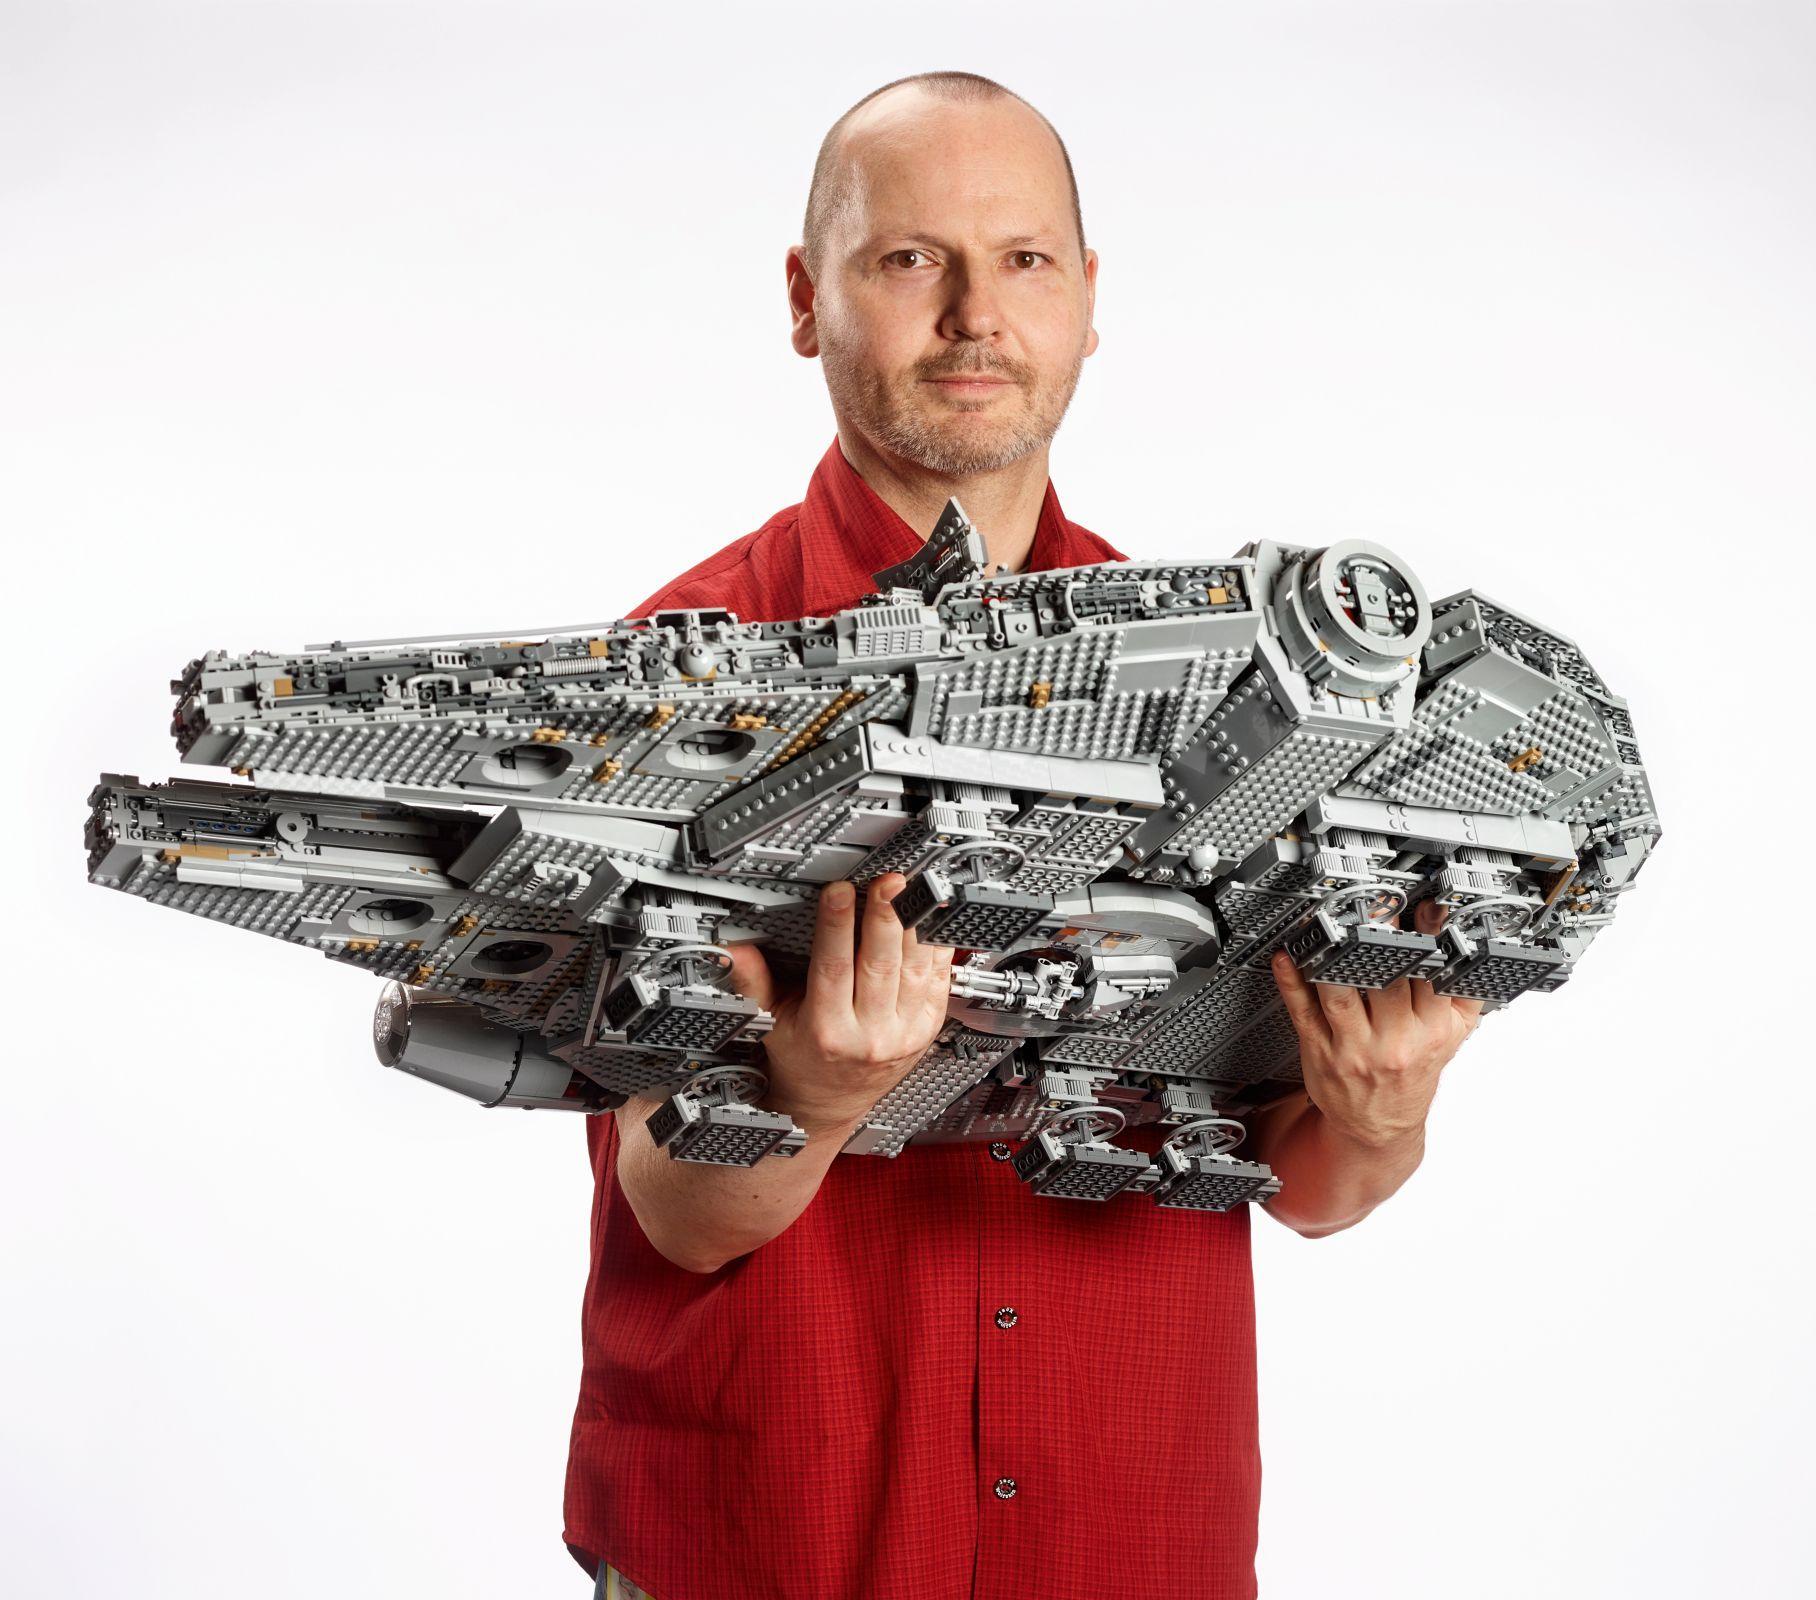 Millennium Falcon 75192 Star Wars Buy Online At The Official Lego Shop Au Millennium Falcon Lego Lego Star Wars Lego Star